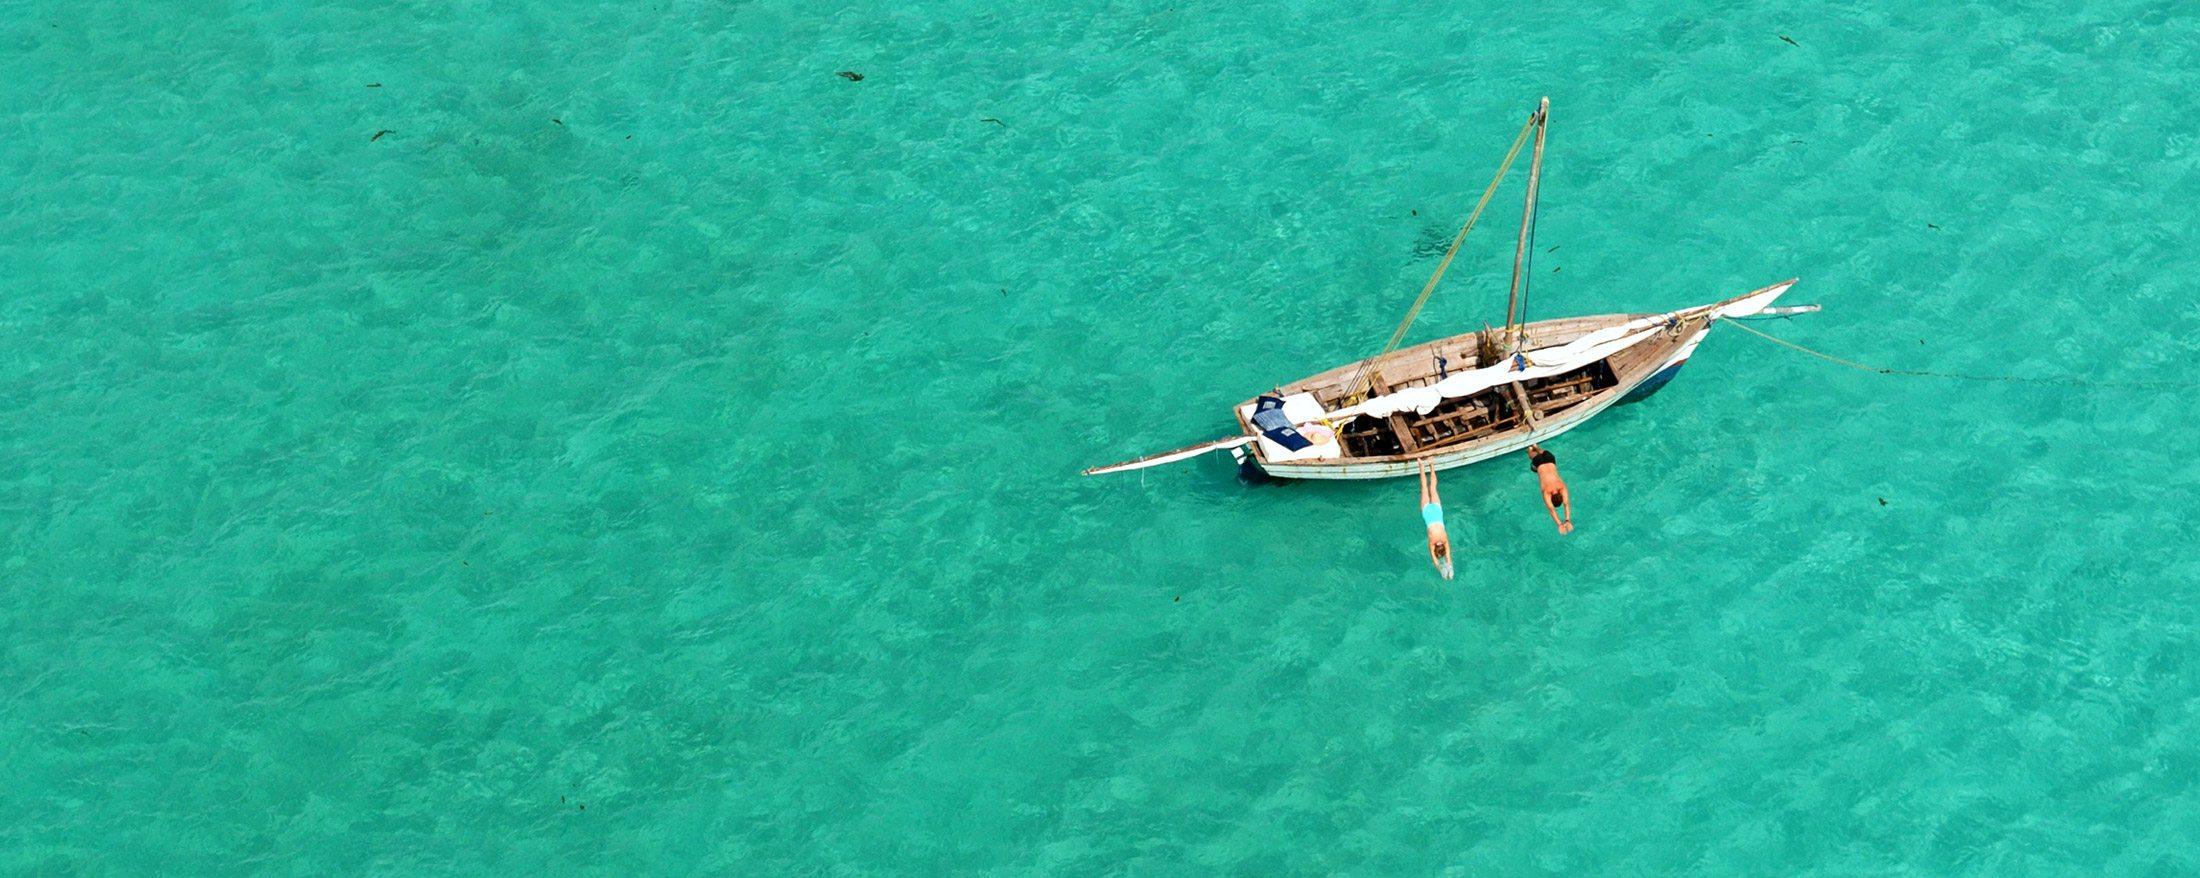 The clear waters of Vamizi Island invite plenty of snorkelling.